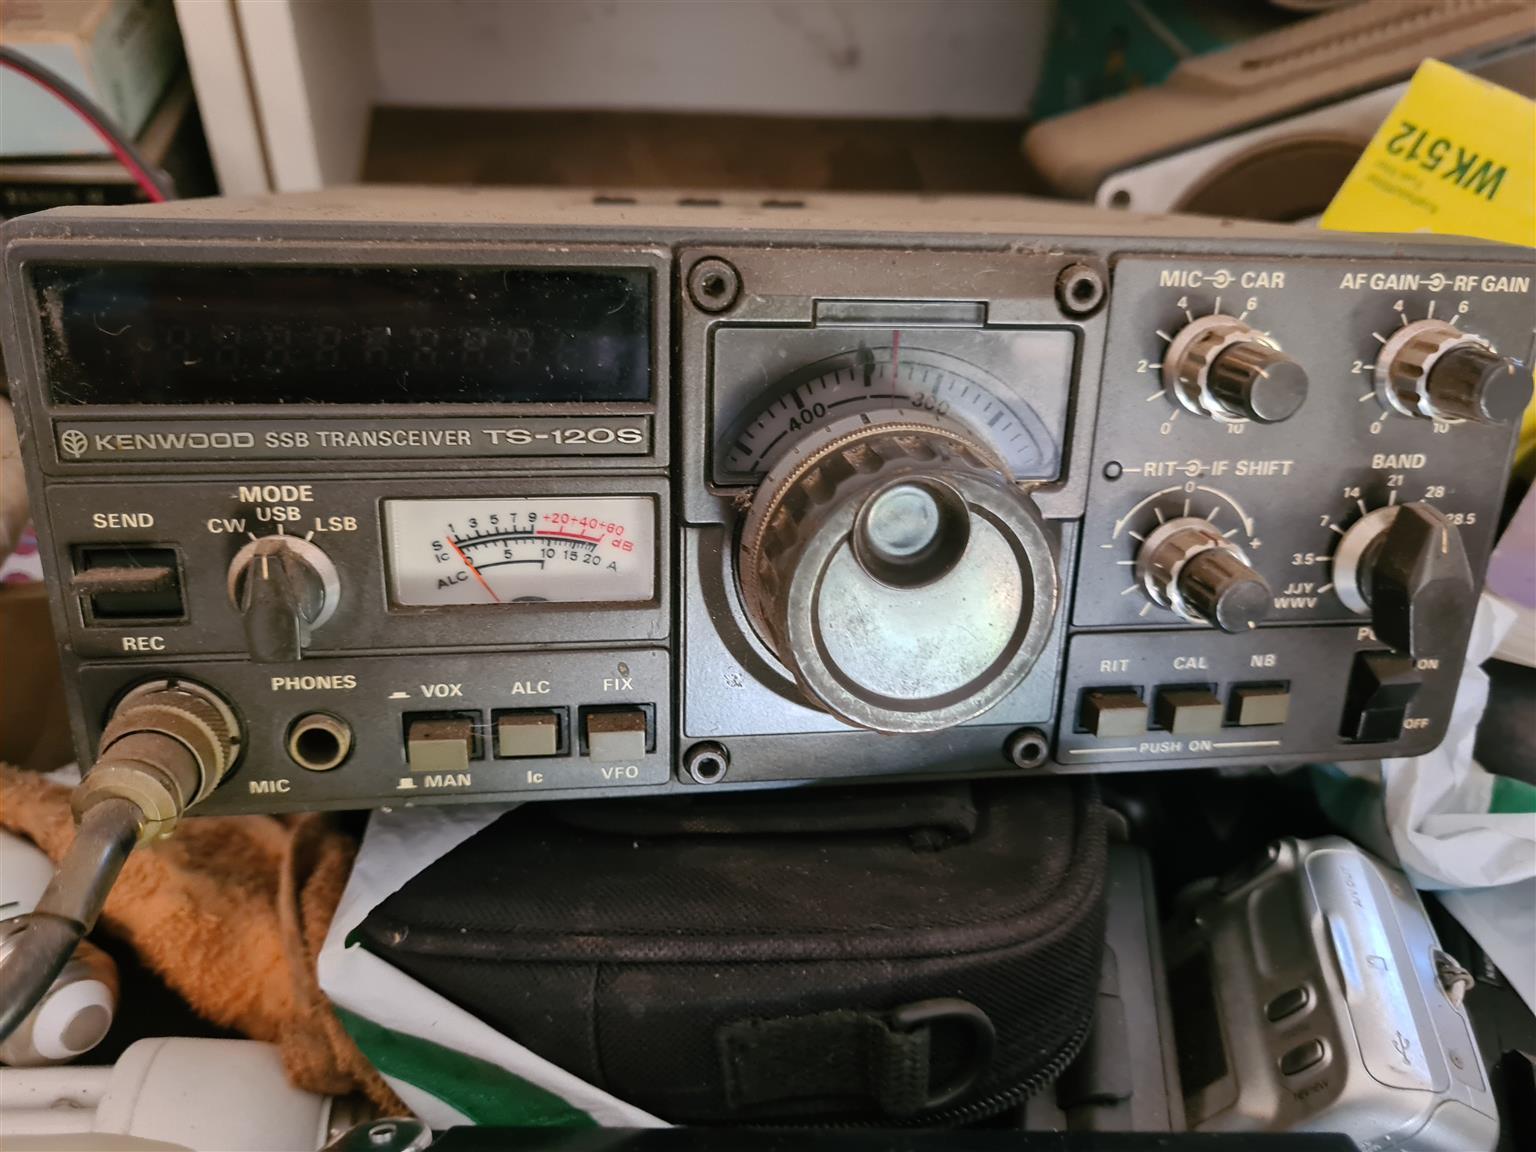 Kenwood TS-120S Transceiver